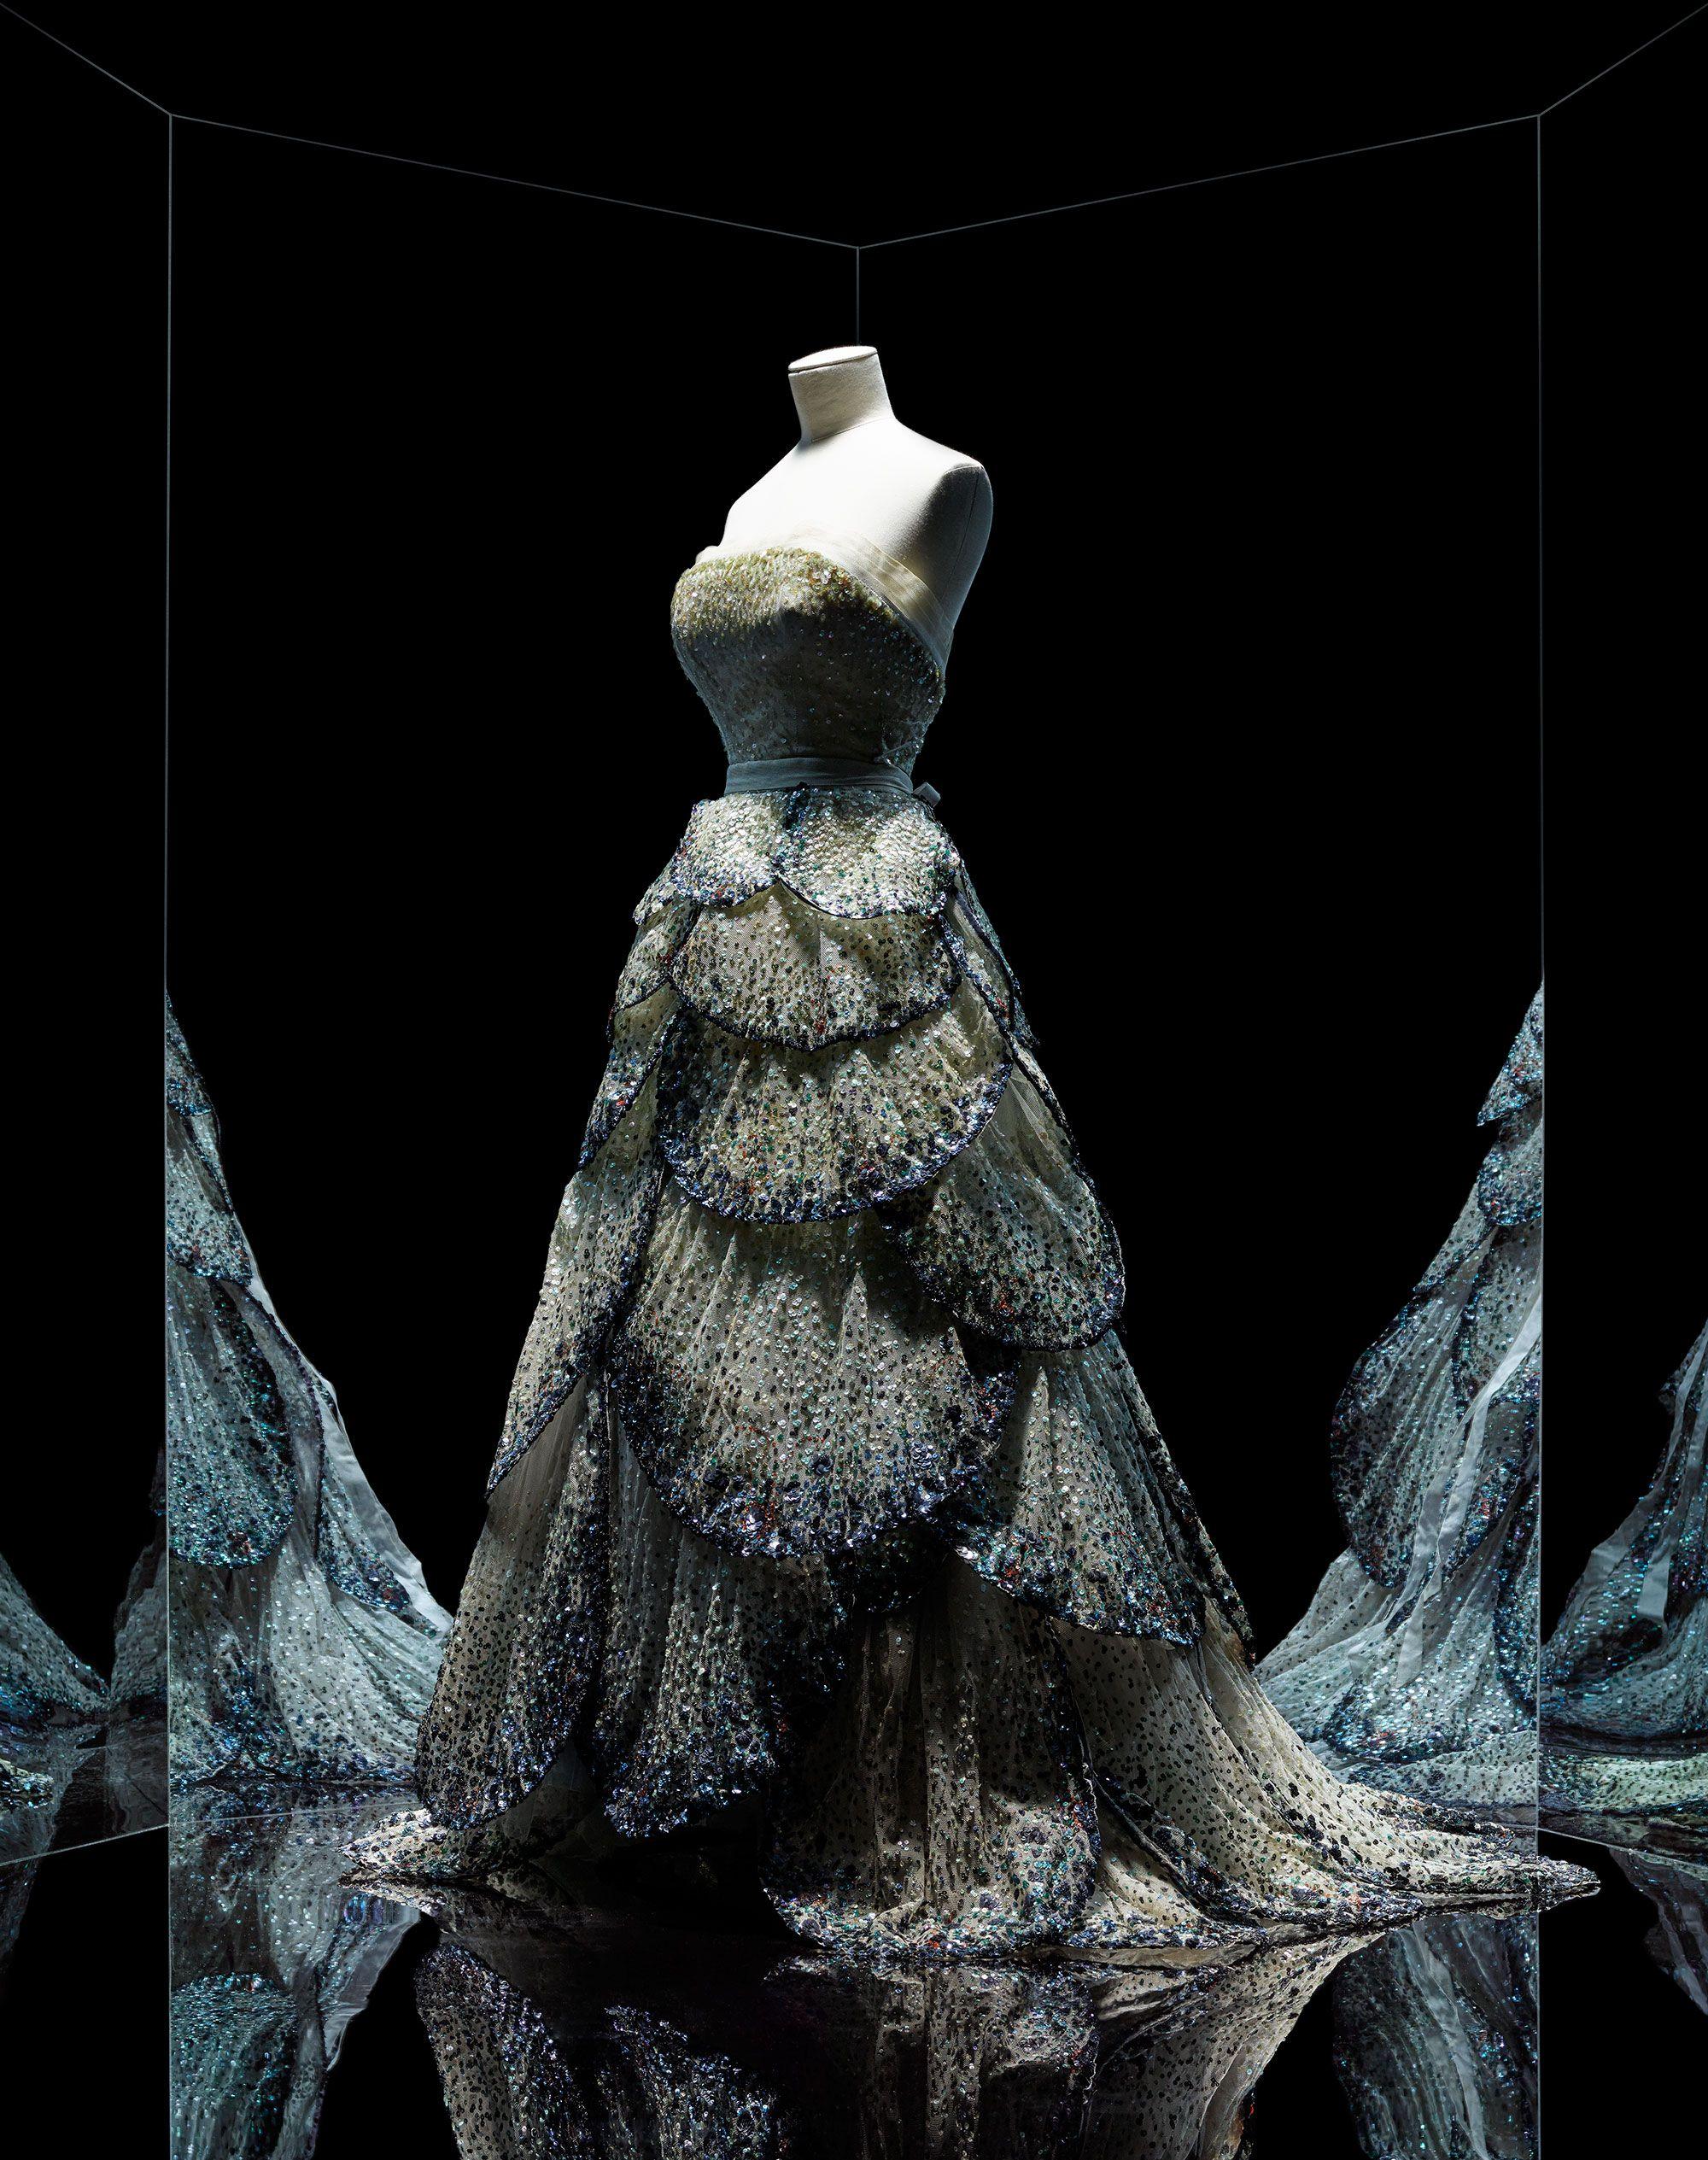 Christian Dior, Junon gown, Haute Couture, Fall-Winter 1949, Milieu du siècle line